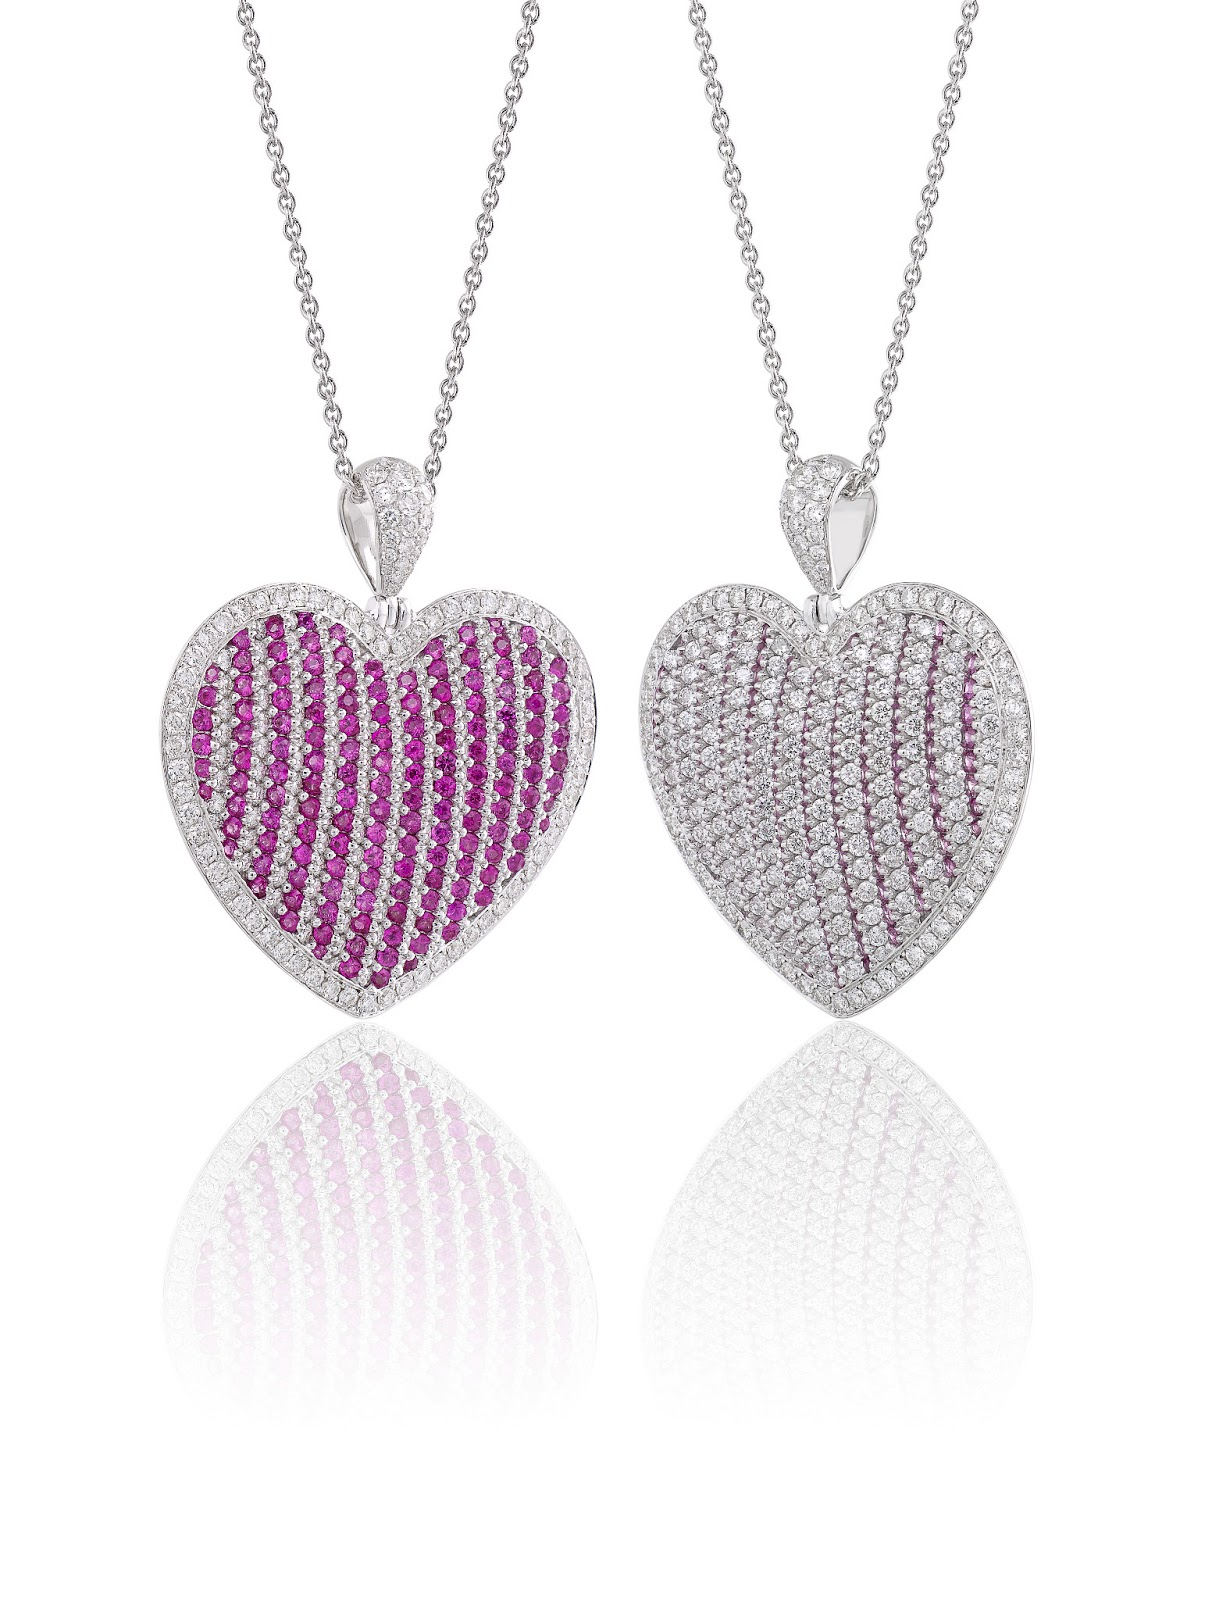 5f4da1ab9 best jewelry: Jewelry and Watch Gifts for Valentine's Day